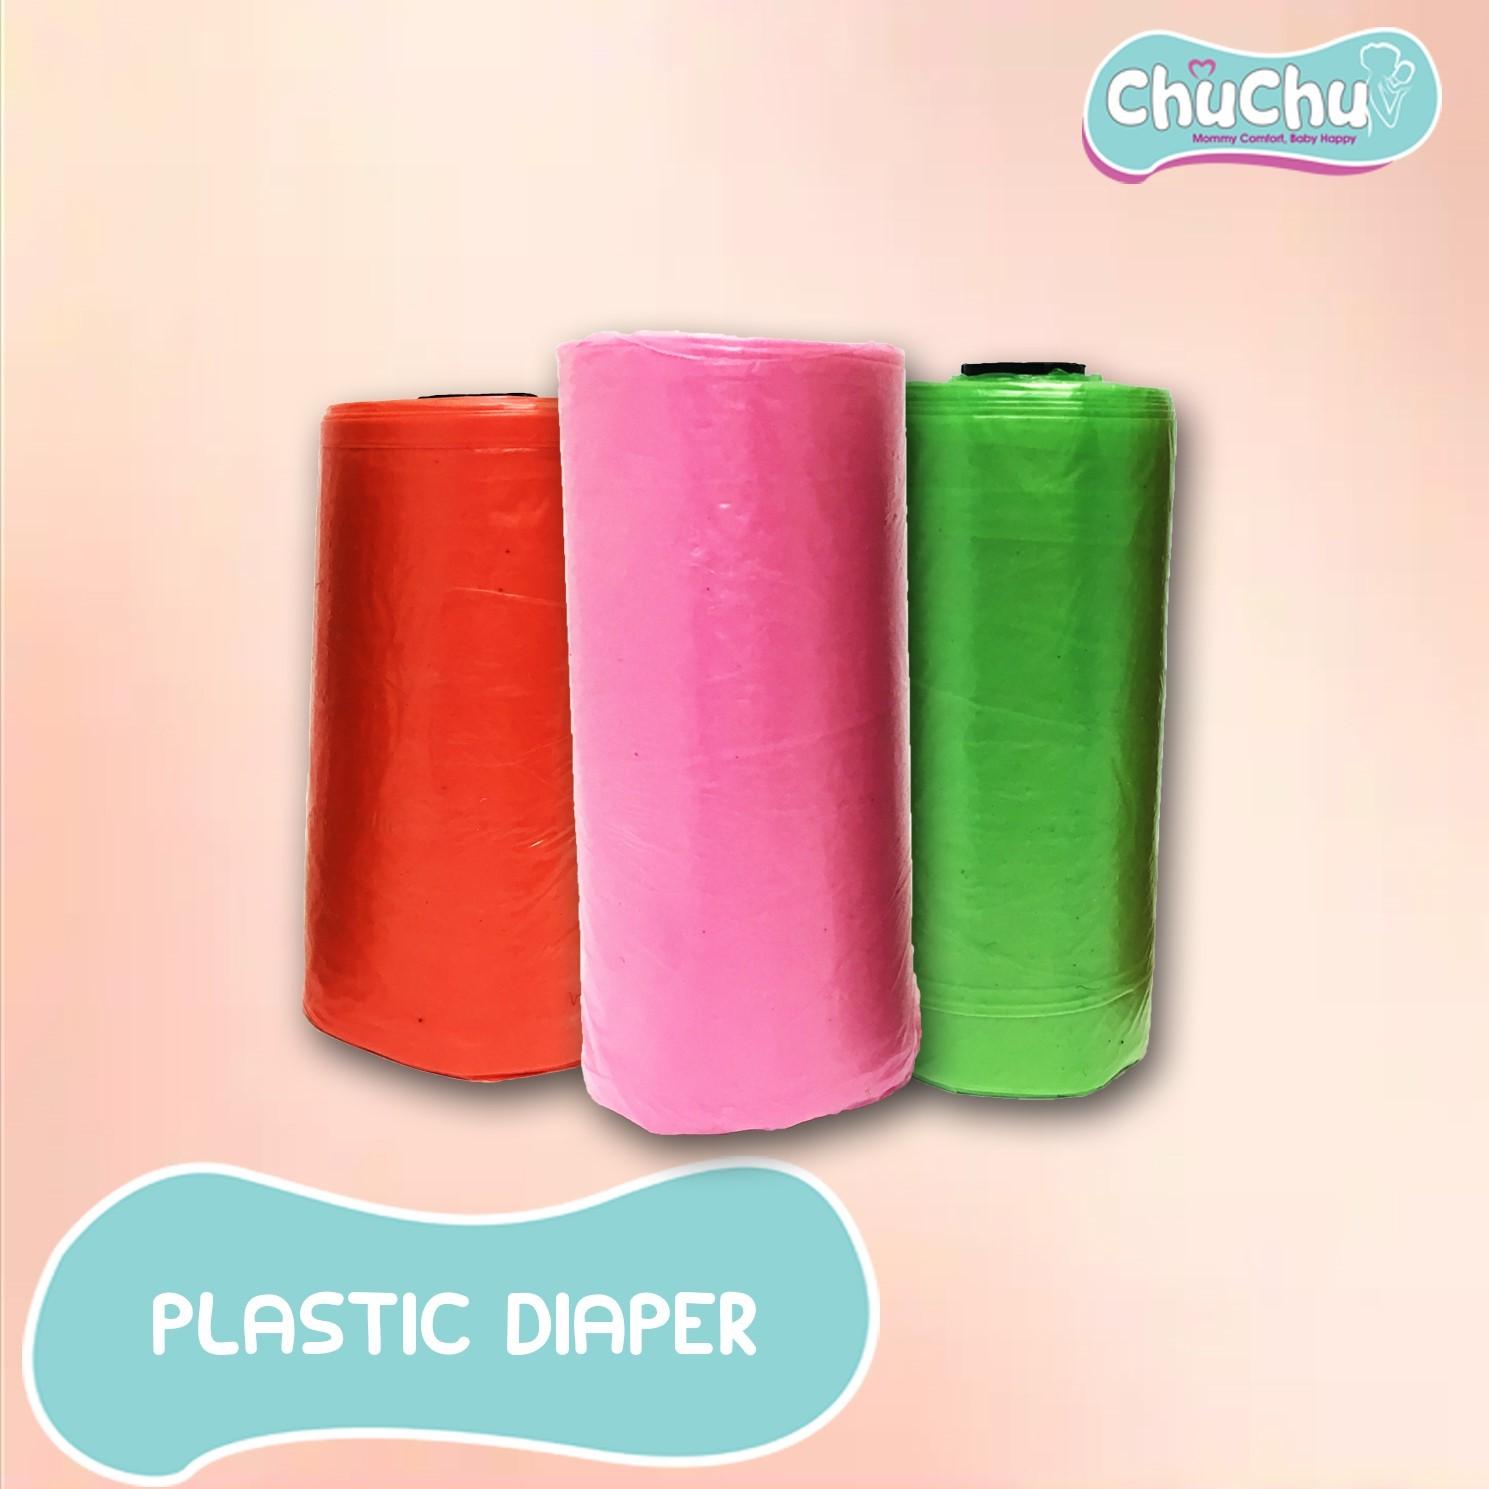 Plastic Diaper ChuChu.jpg